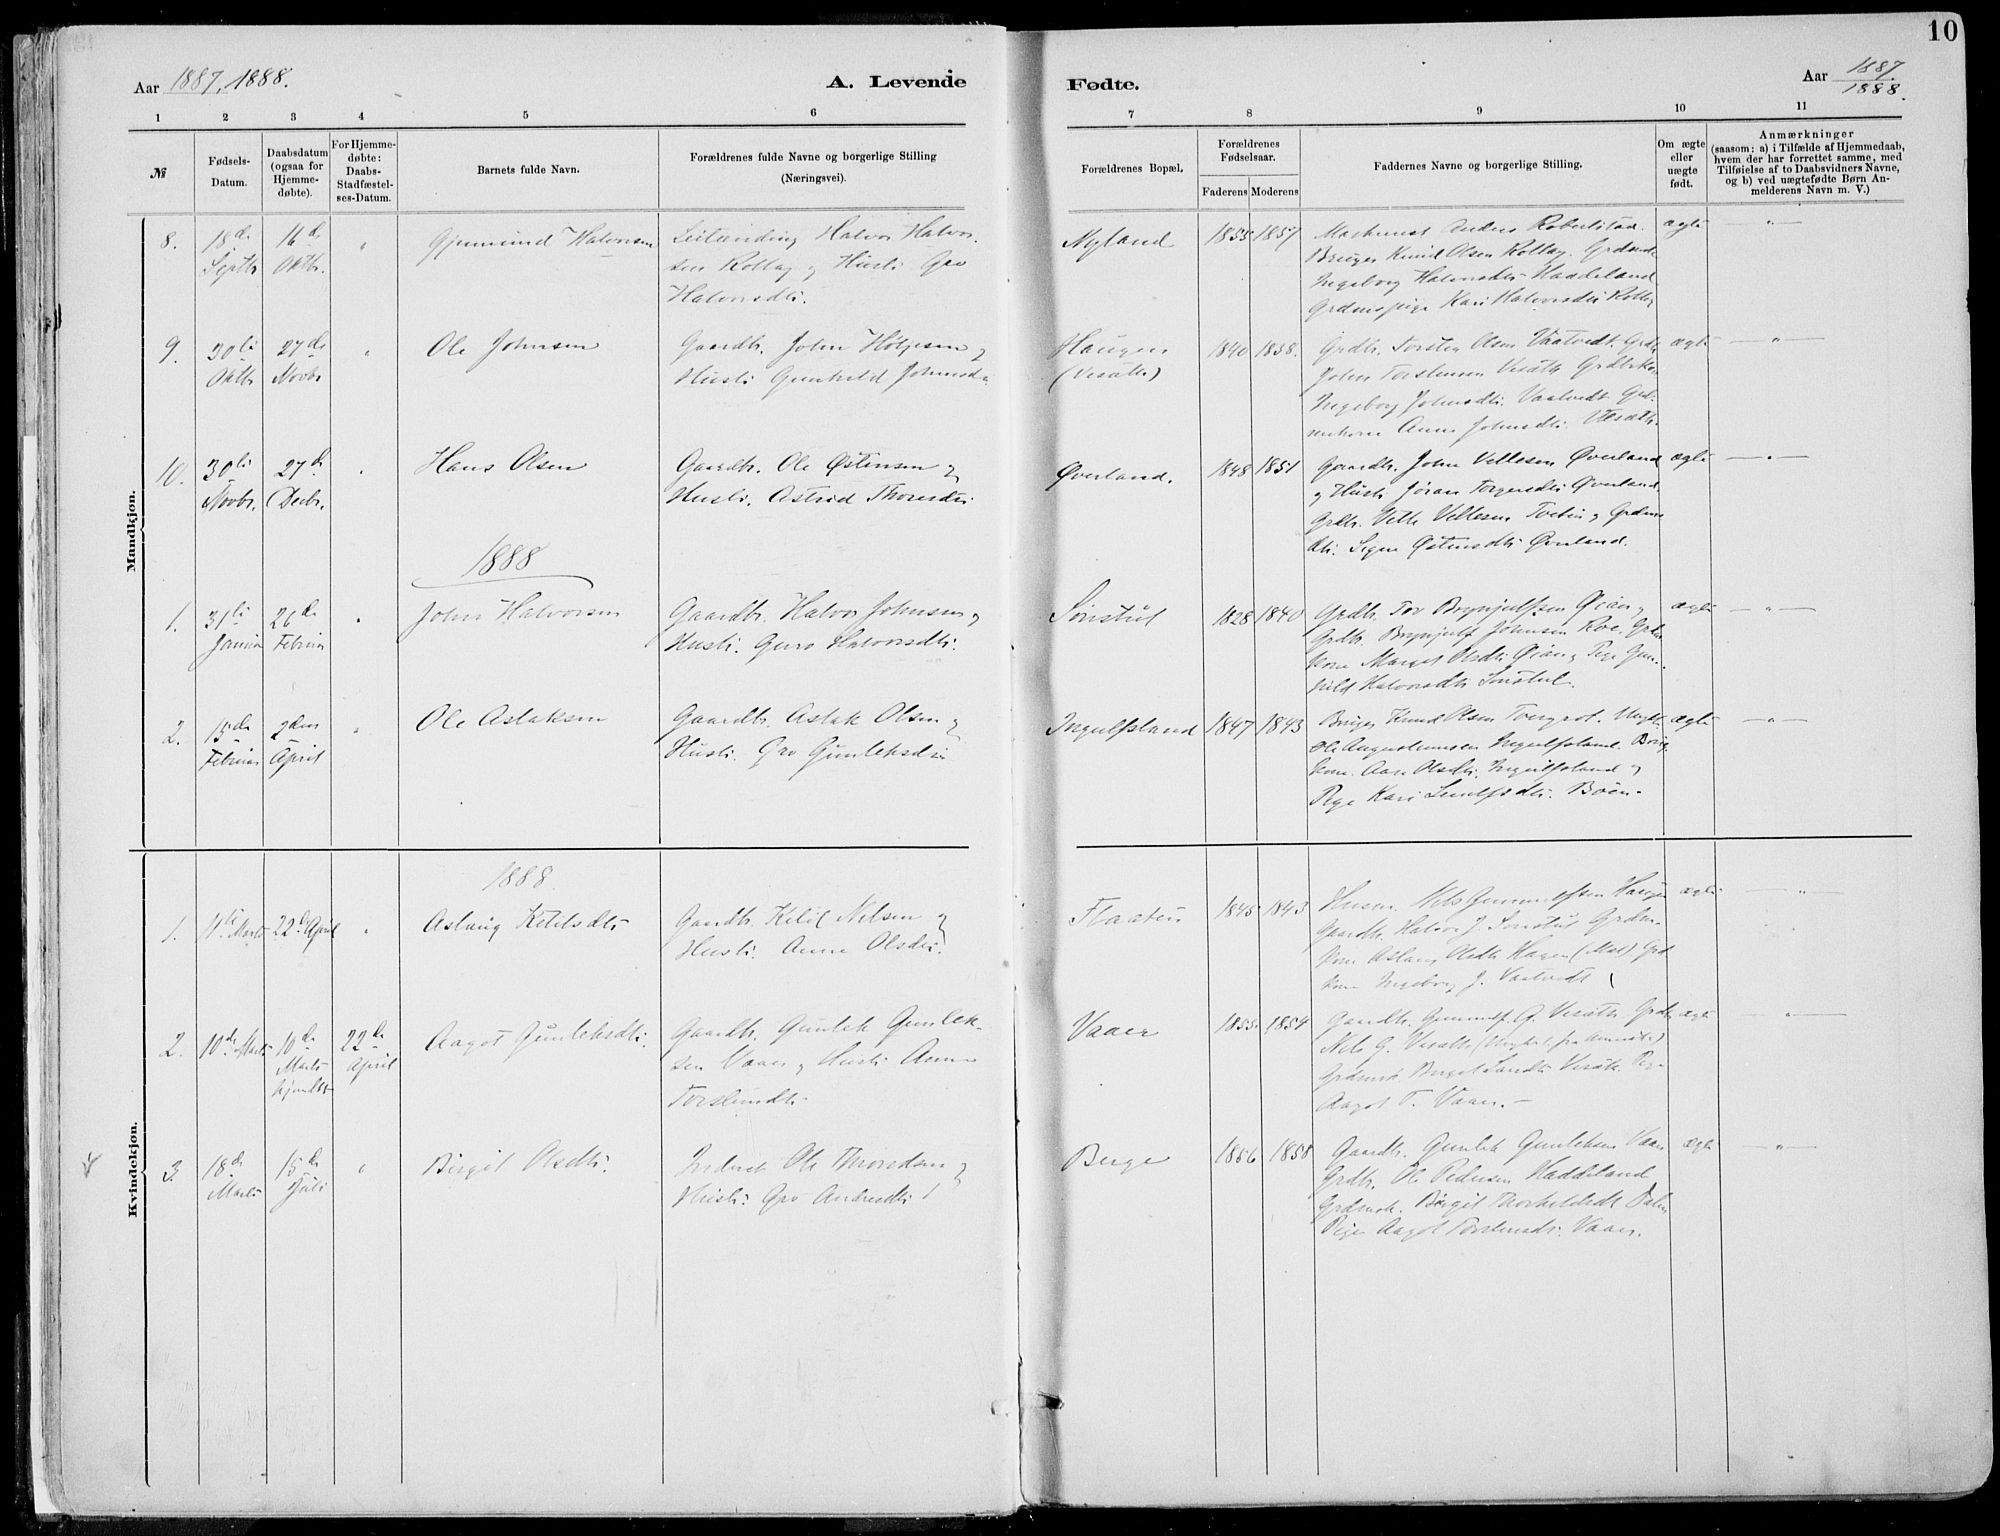 SAKO, Rjukan kirkebøker, F/Fa/L0001: Ministerialbok nr. 1, 1878-1912, s. 10